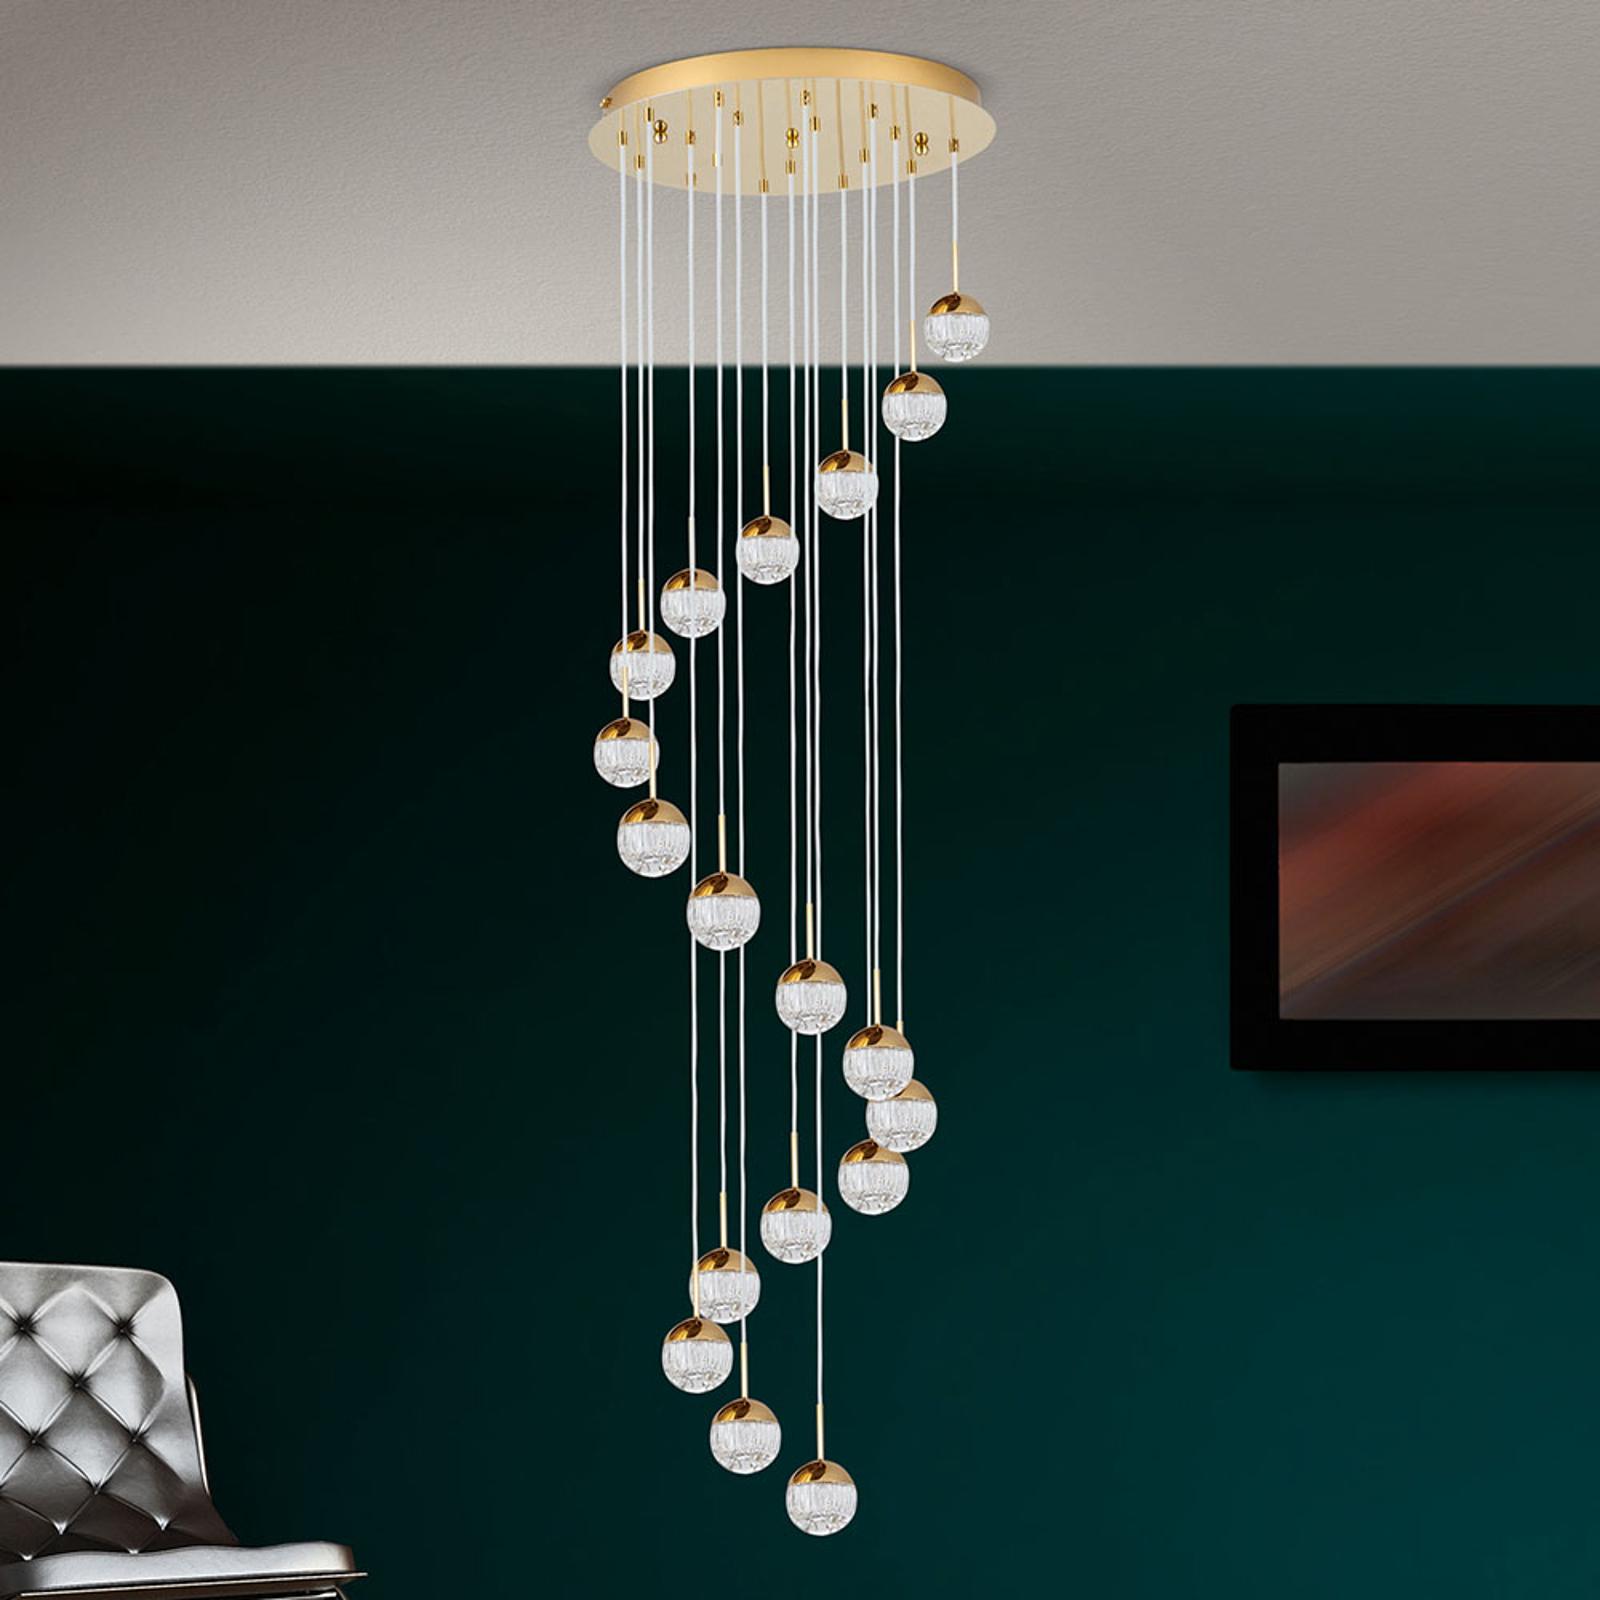 Lampa wisząca LED Ball 18-pkt. złota/kremowa